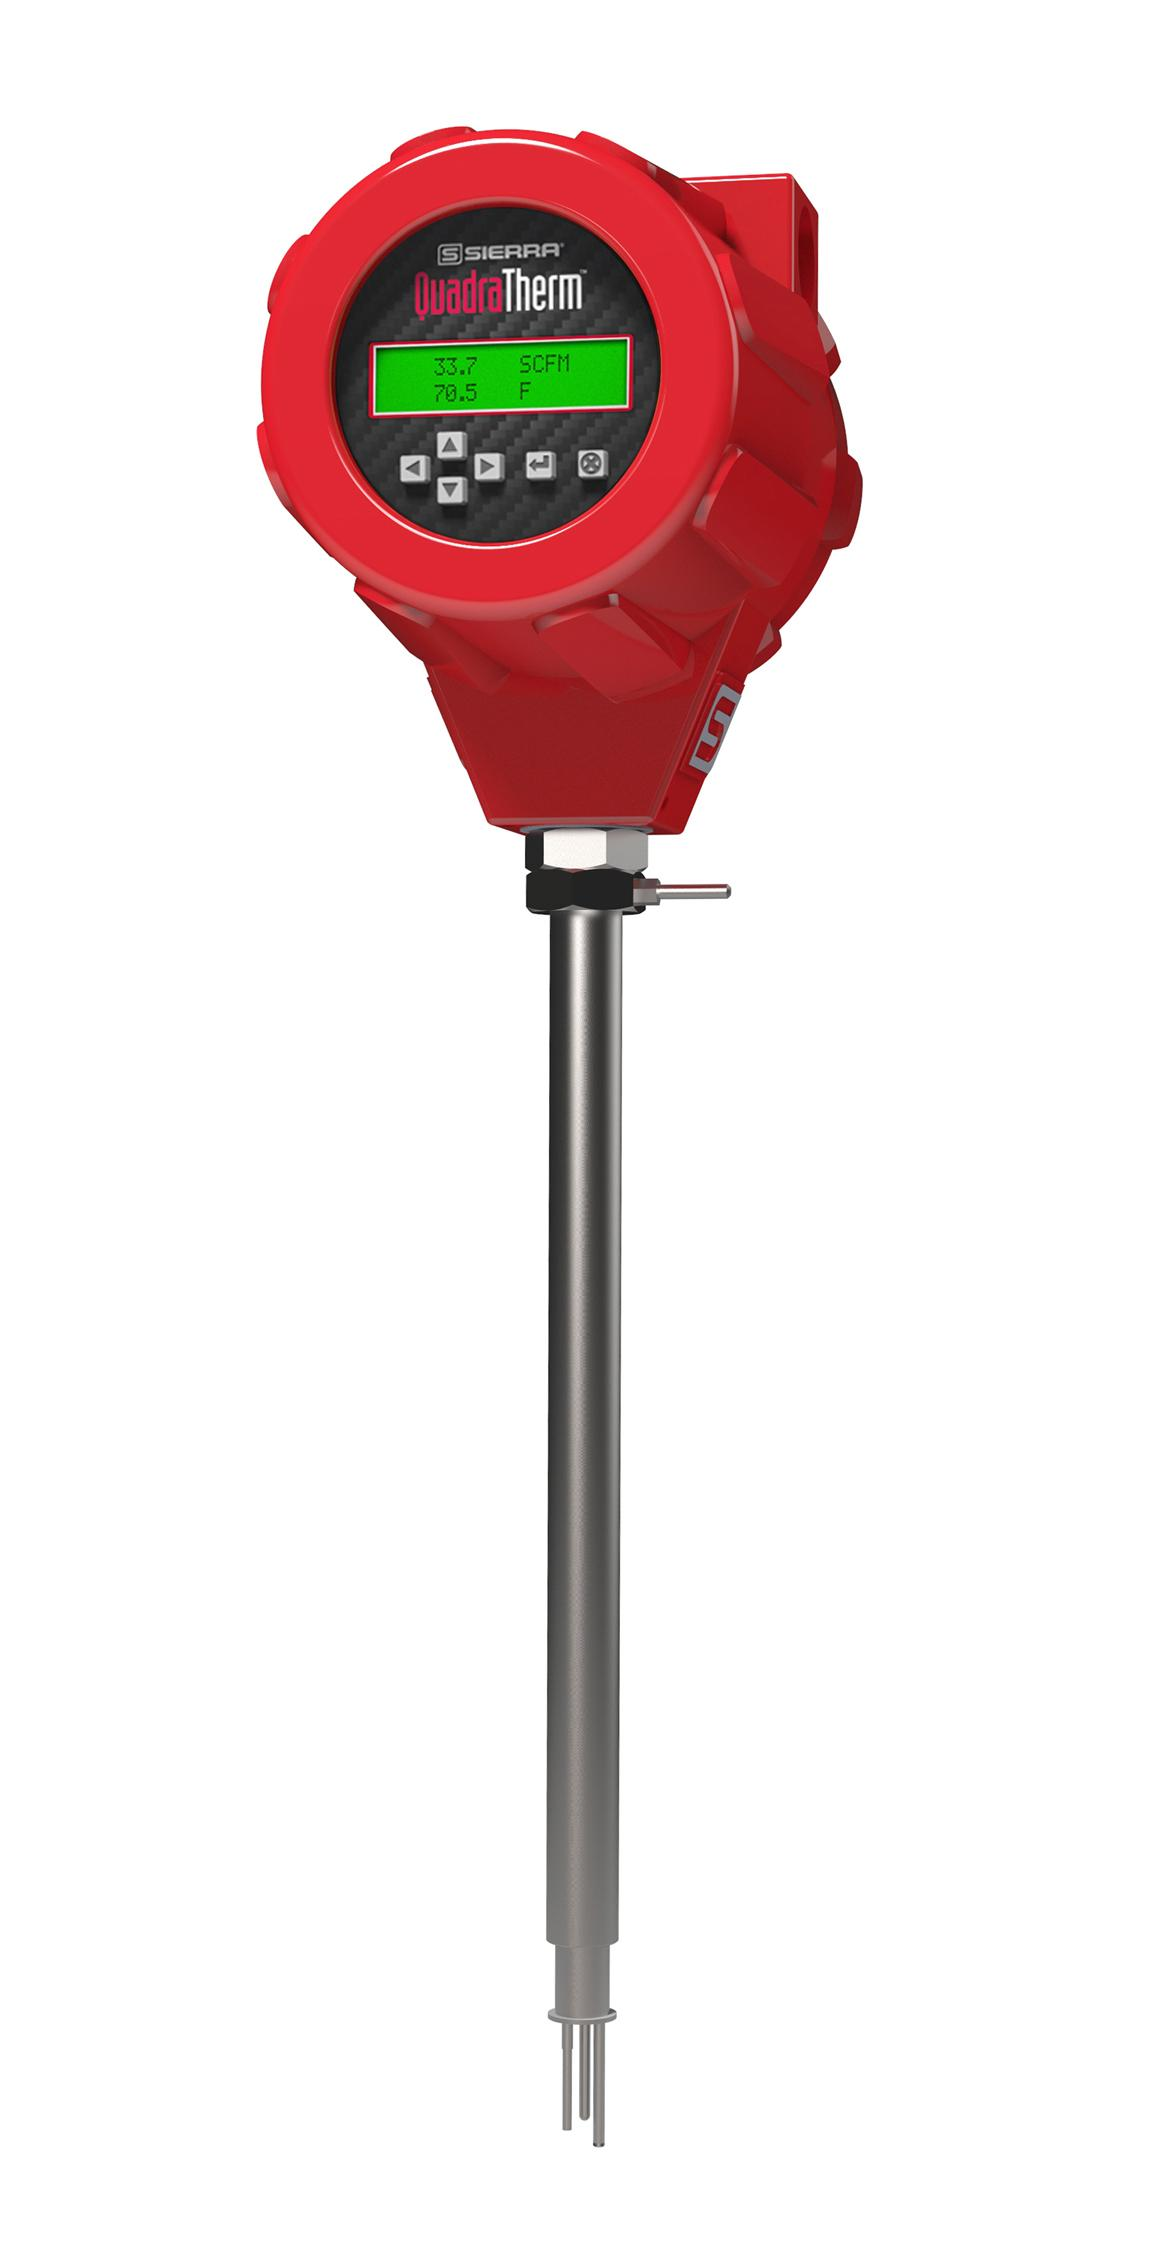 Insertion-probe quadratherm mass flow meter